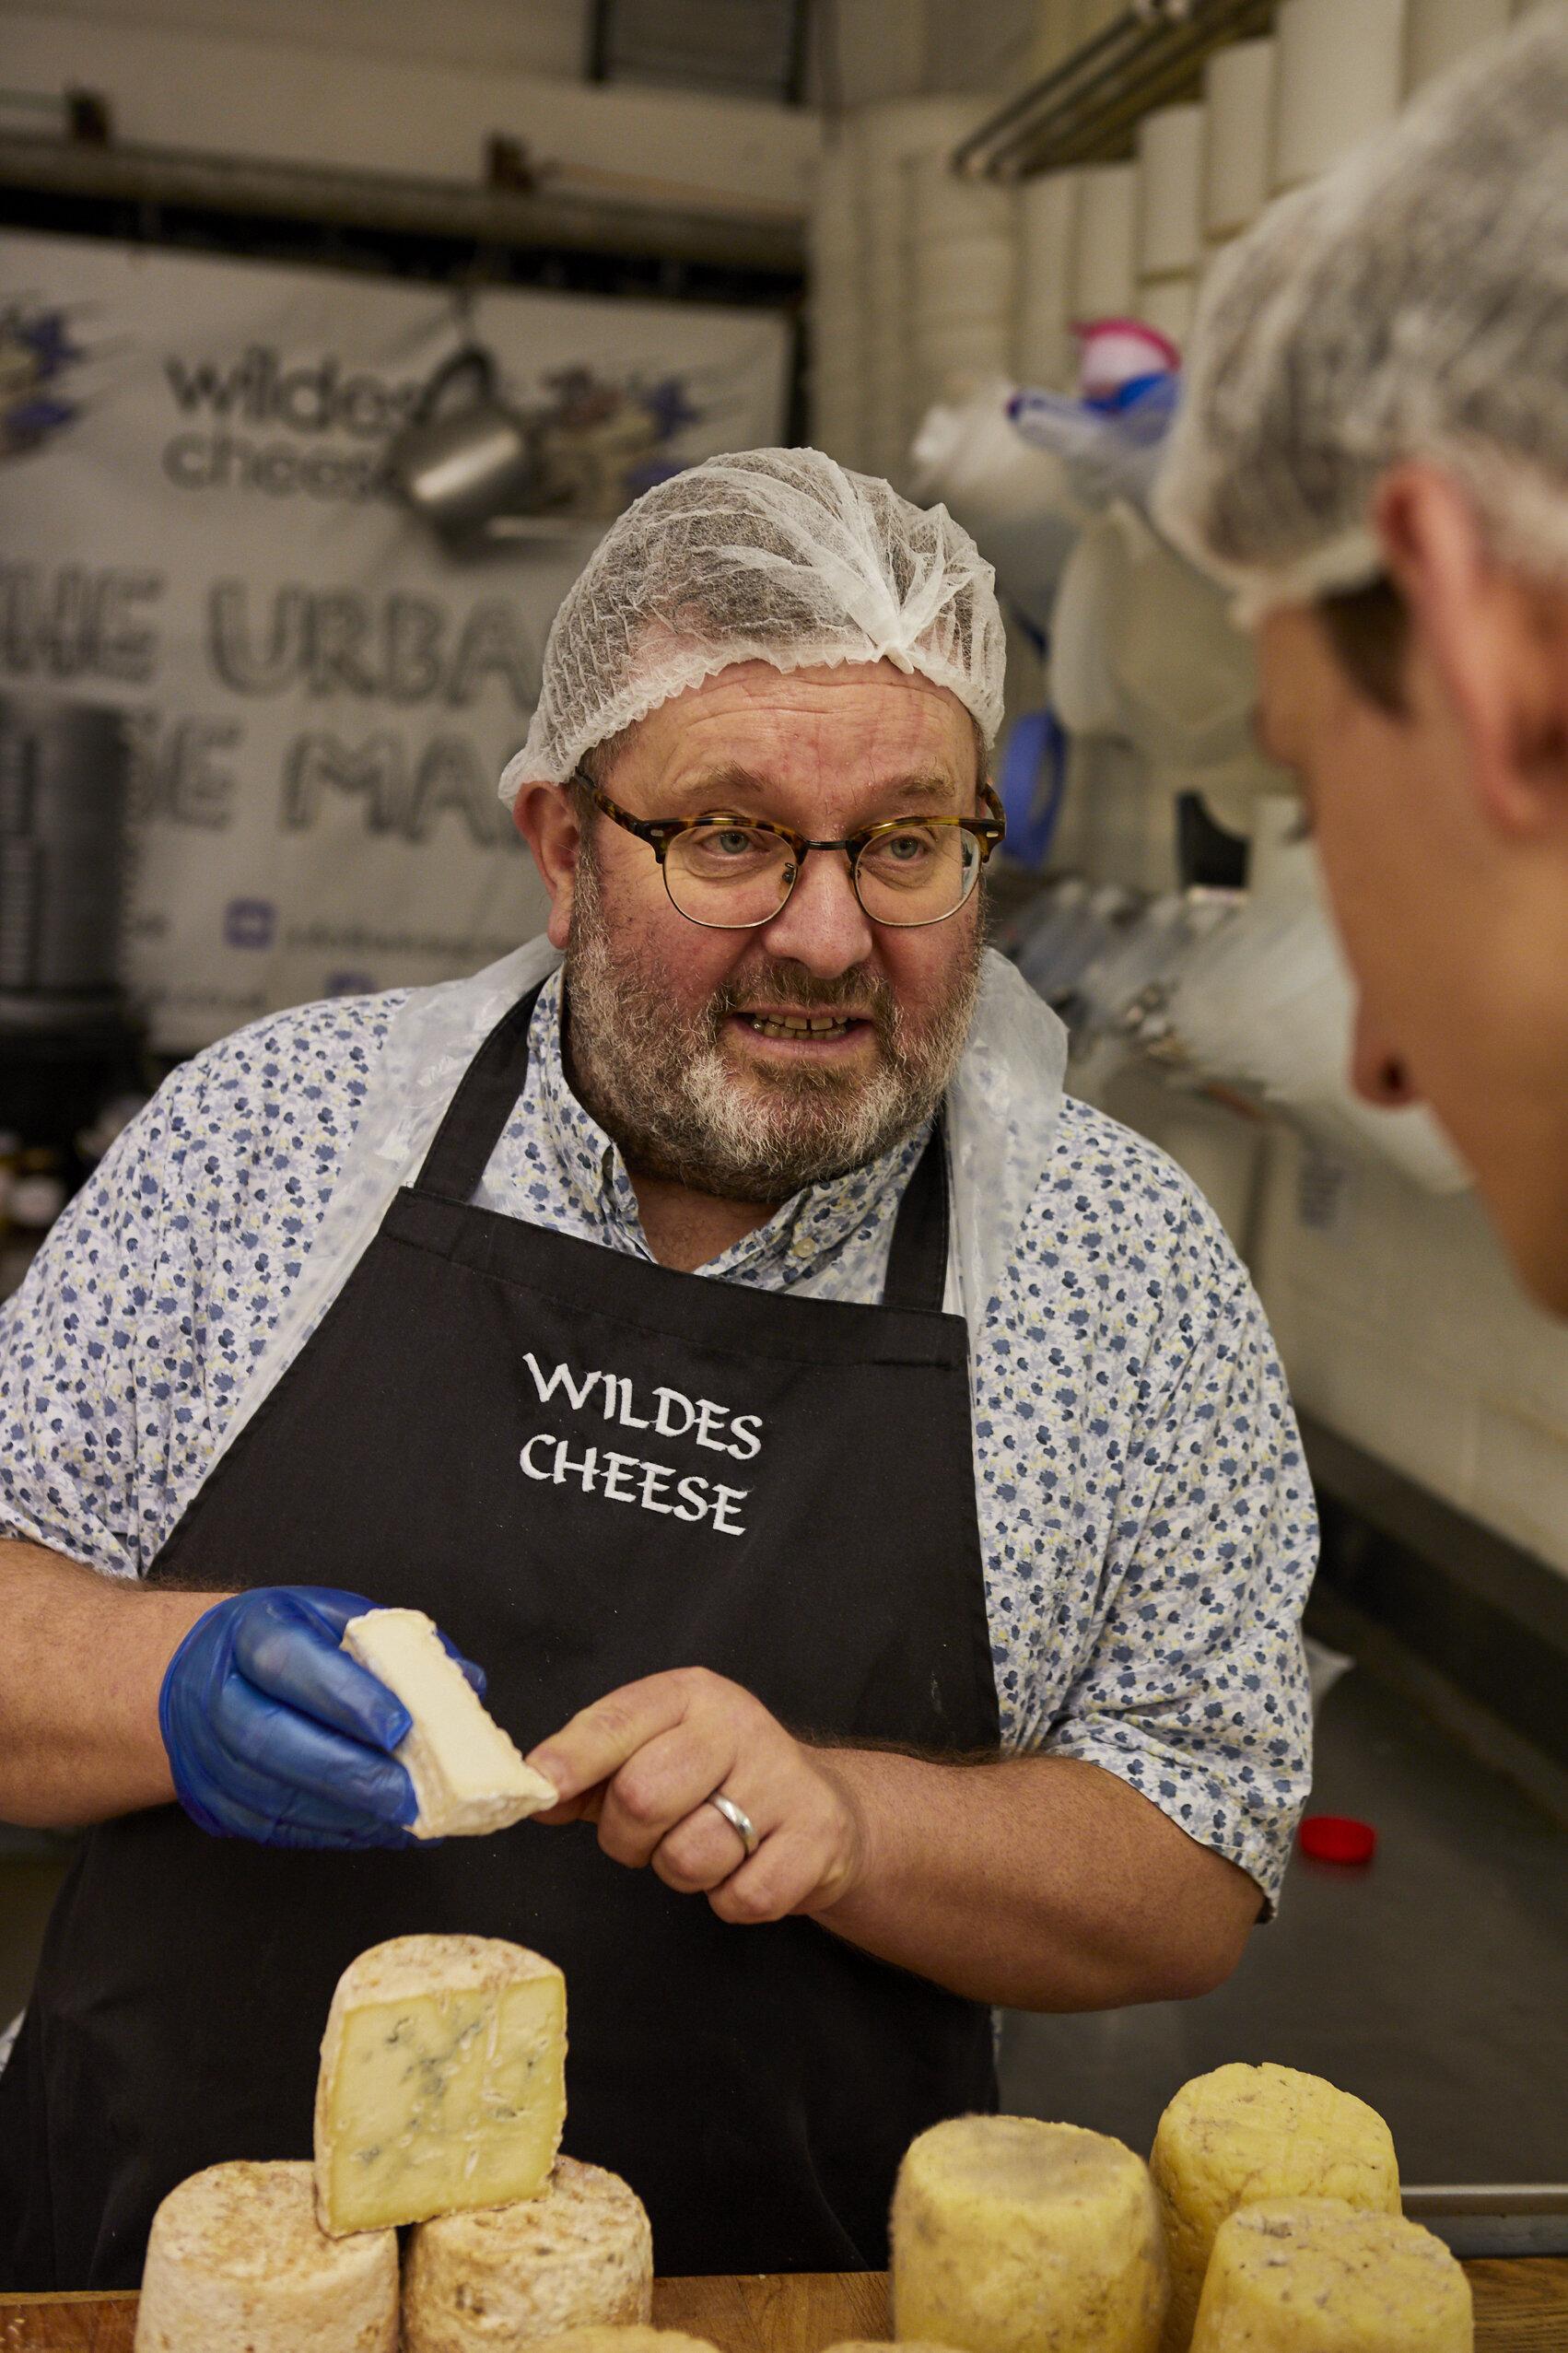 wildes-cheeses-london-cheesery-cheesemaker-national-geographic-food-nationalgeographic-nationalgeographicfood-wildescheeses-documentaryphotography-reportage-food-foodie-foodporn-realfood